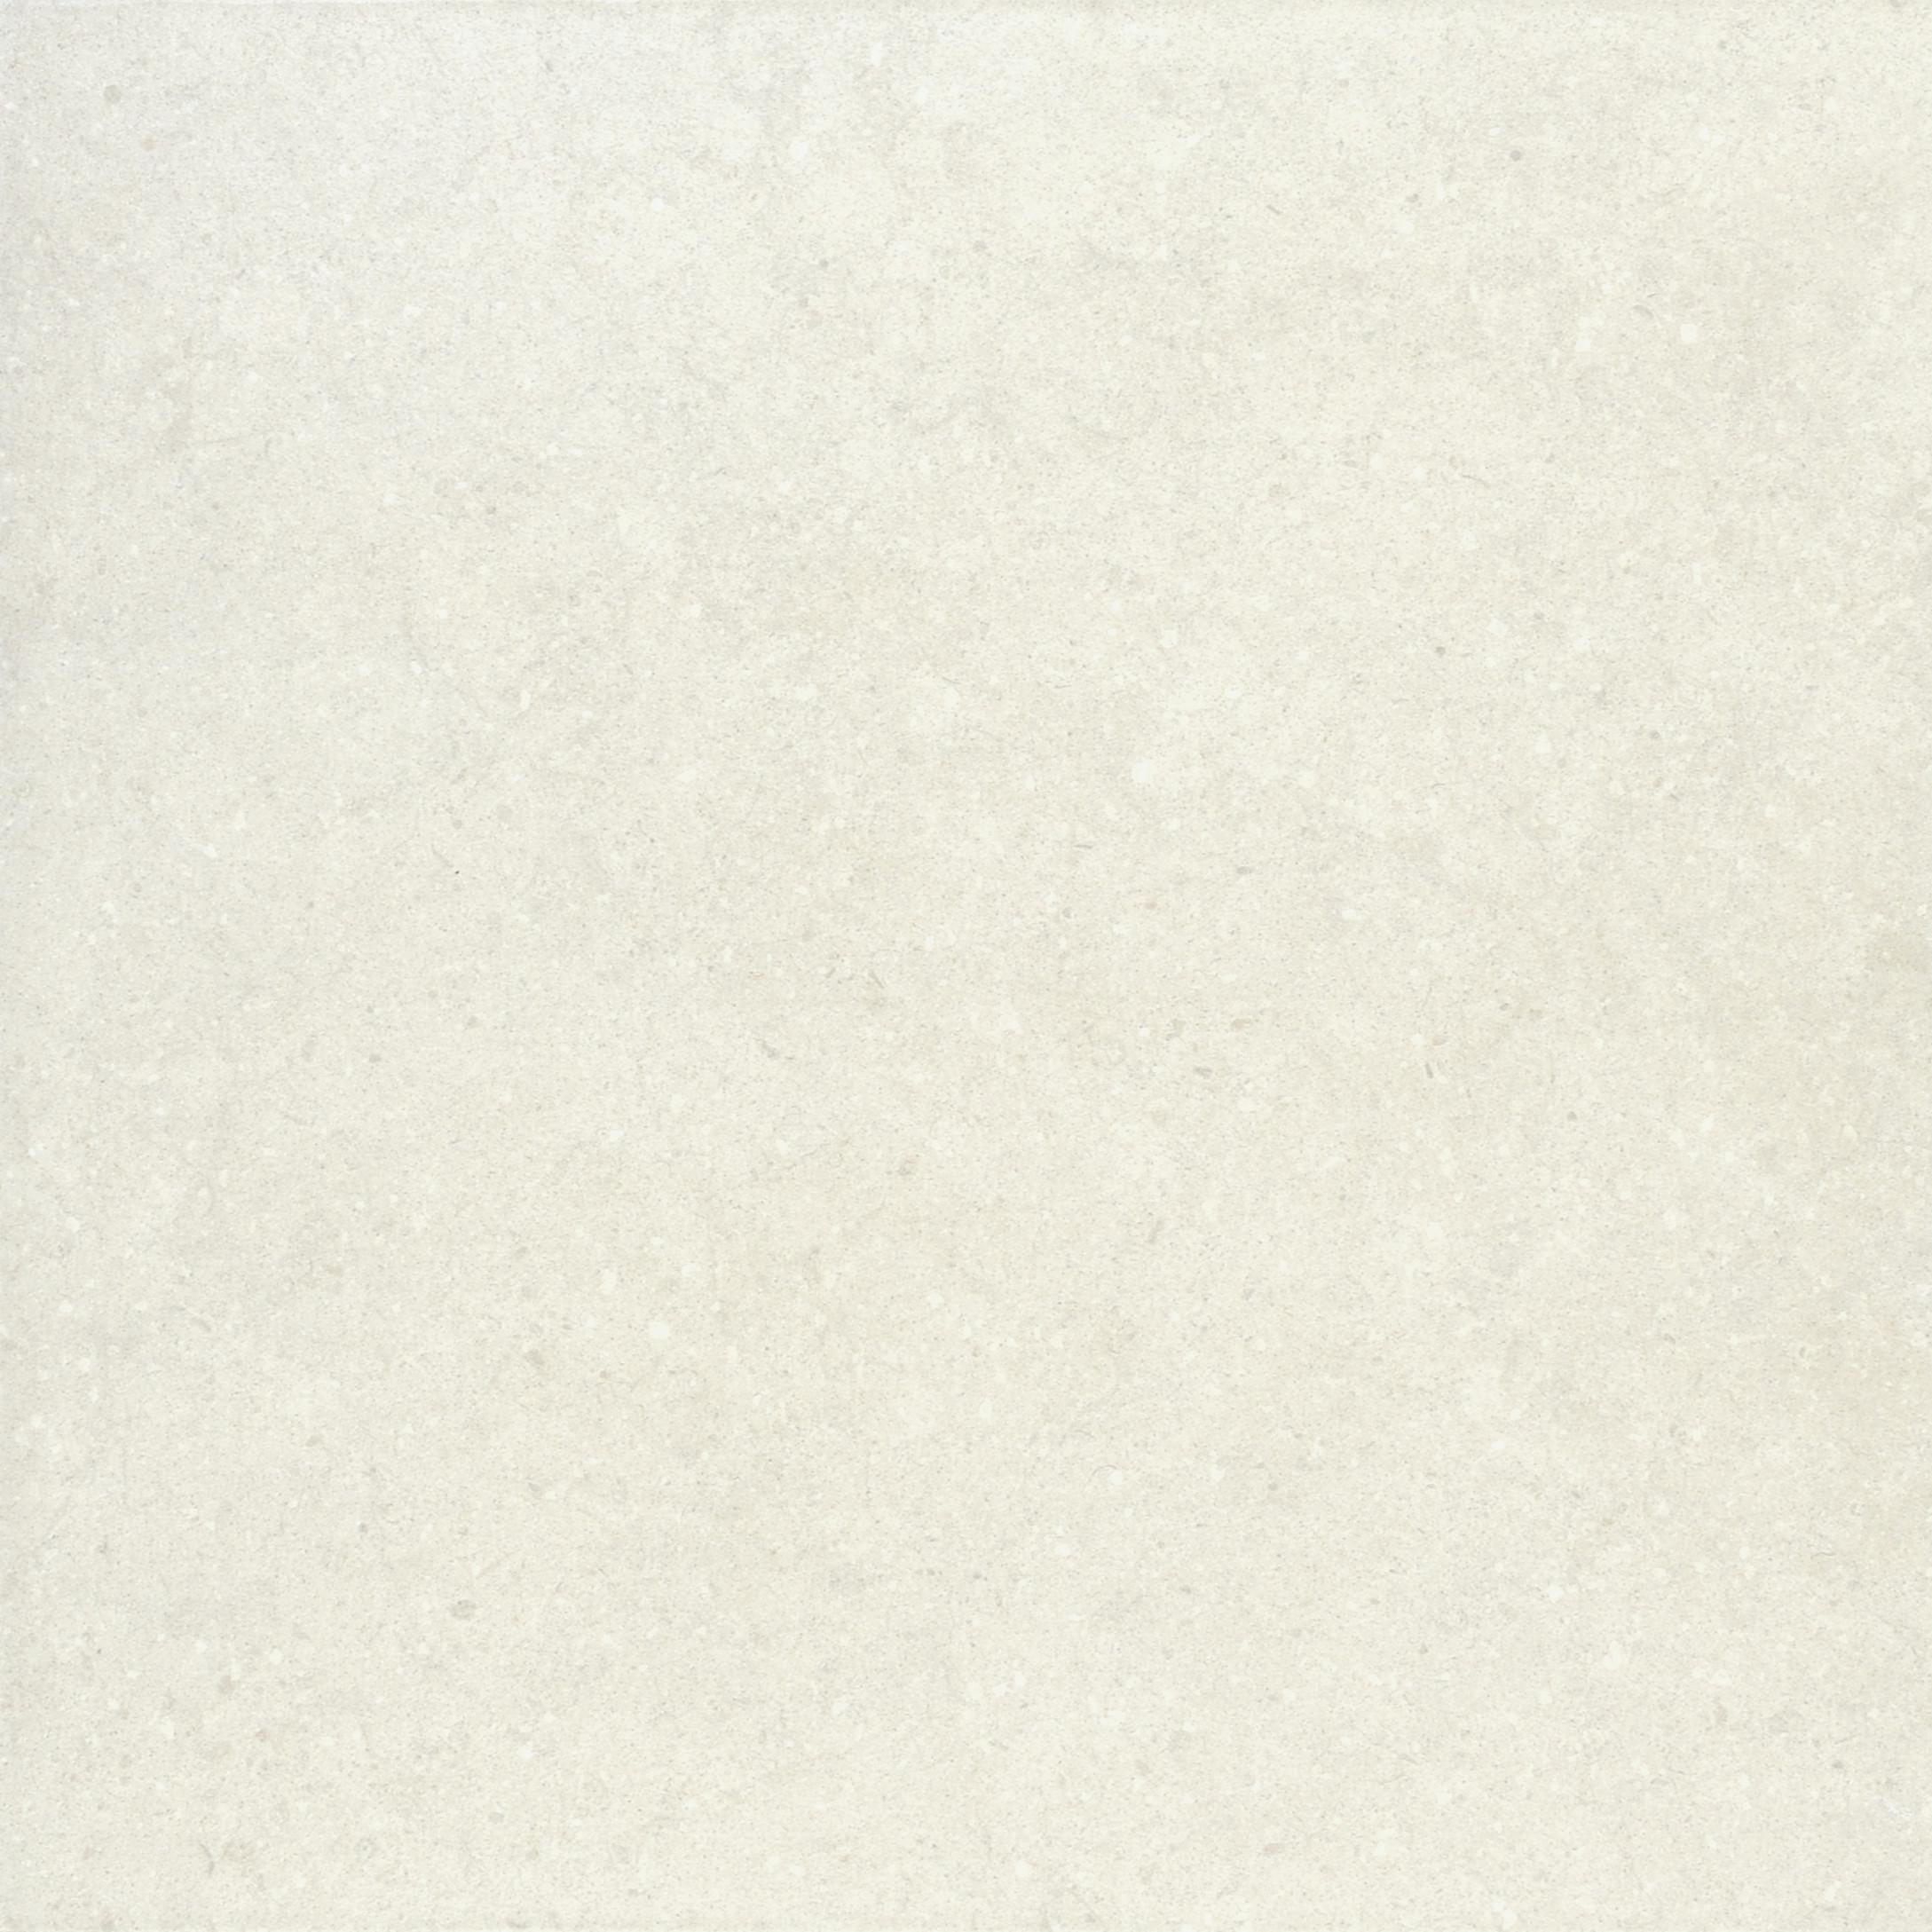 V1299/1300 Skyport White